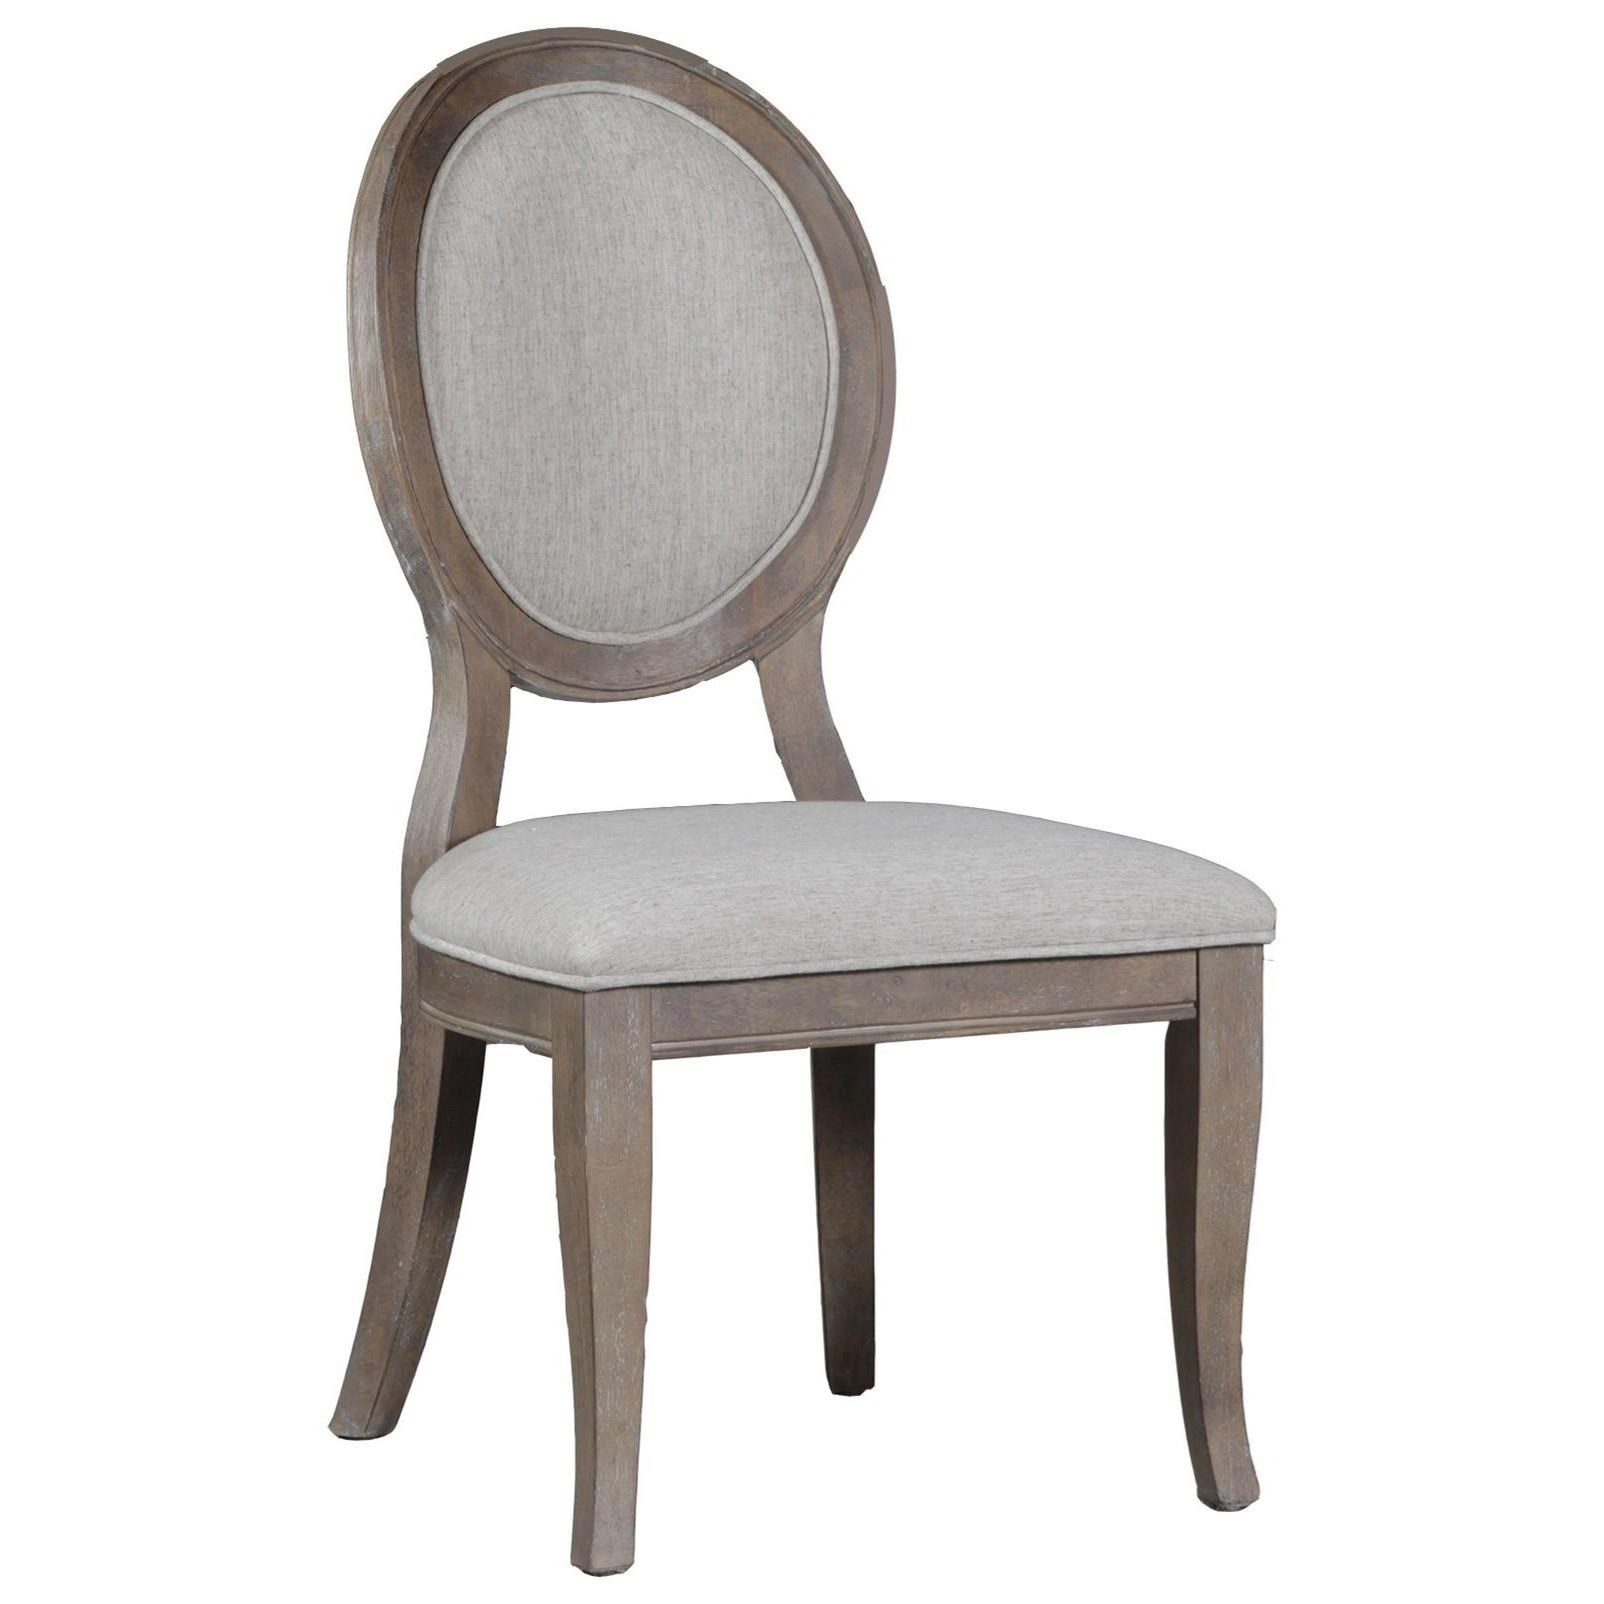 Lenoir Lenoir Side Chair by Powell at HomeWorld Furniture